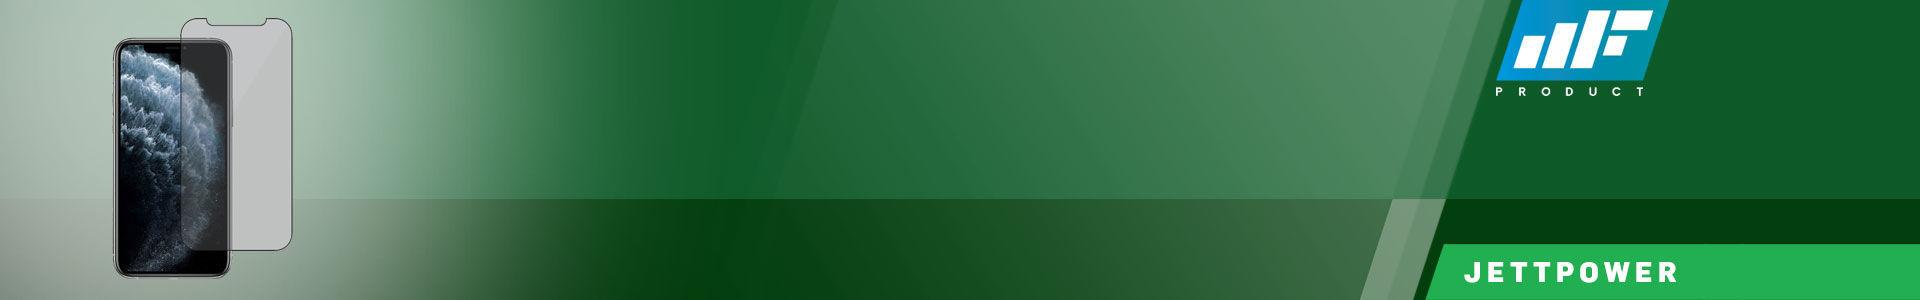 MF Product Jettpower 0387 Privacy Ekran Koruyucu Cam iPhone Xs Max / 11 Pro Max tam sana göre!